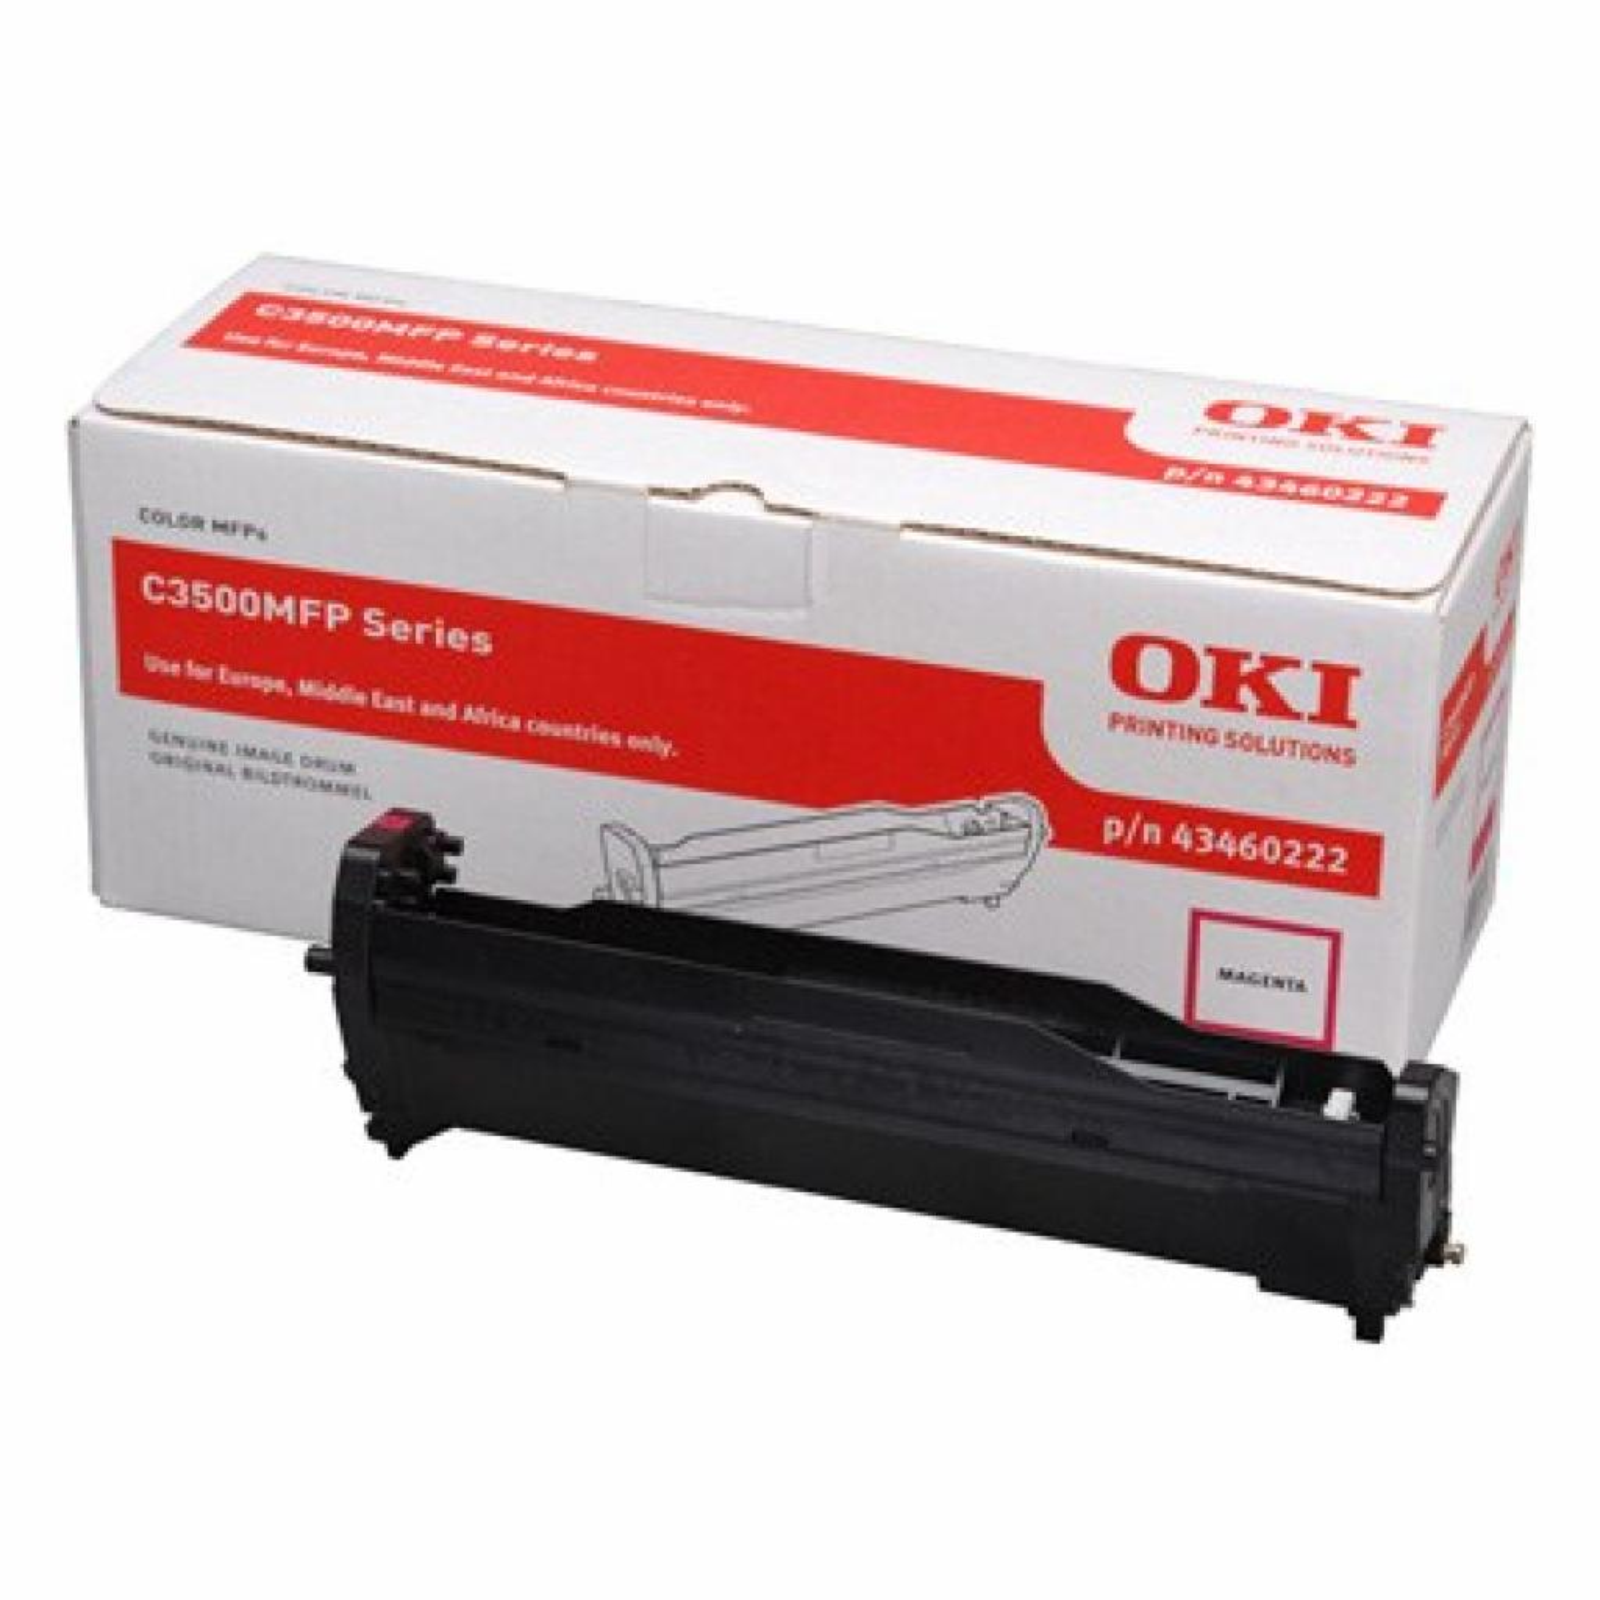 Фотокондуктор OKI C3520MFP/3530MFP/MC350/360 Magenta (43460222)